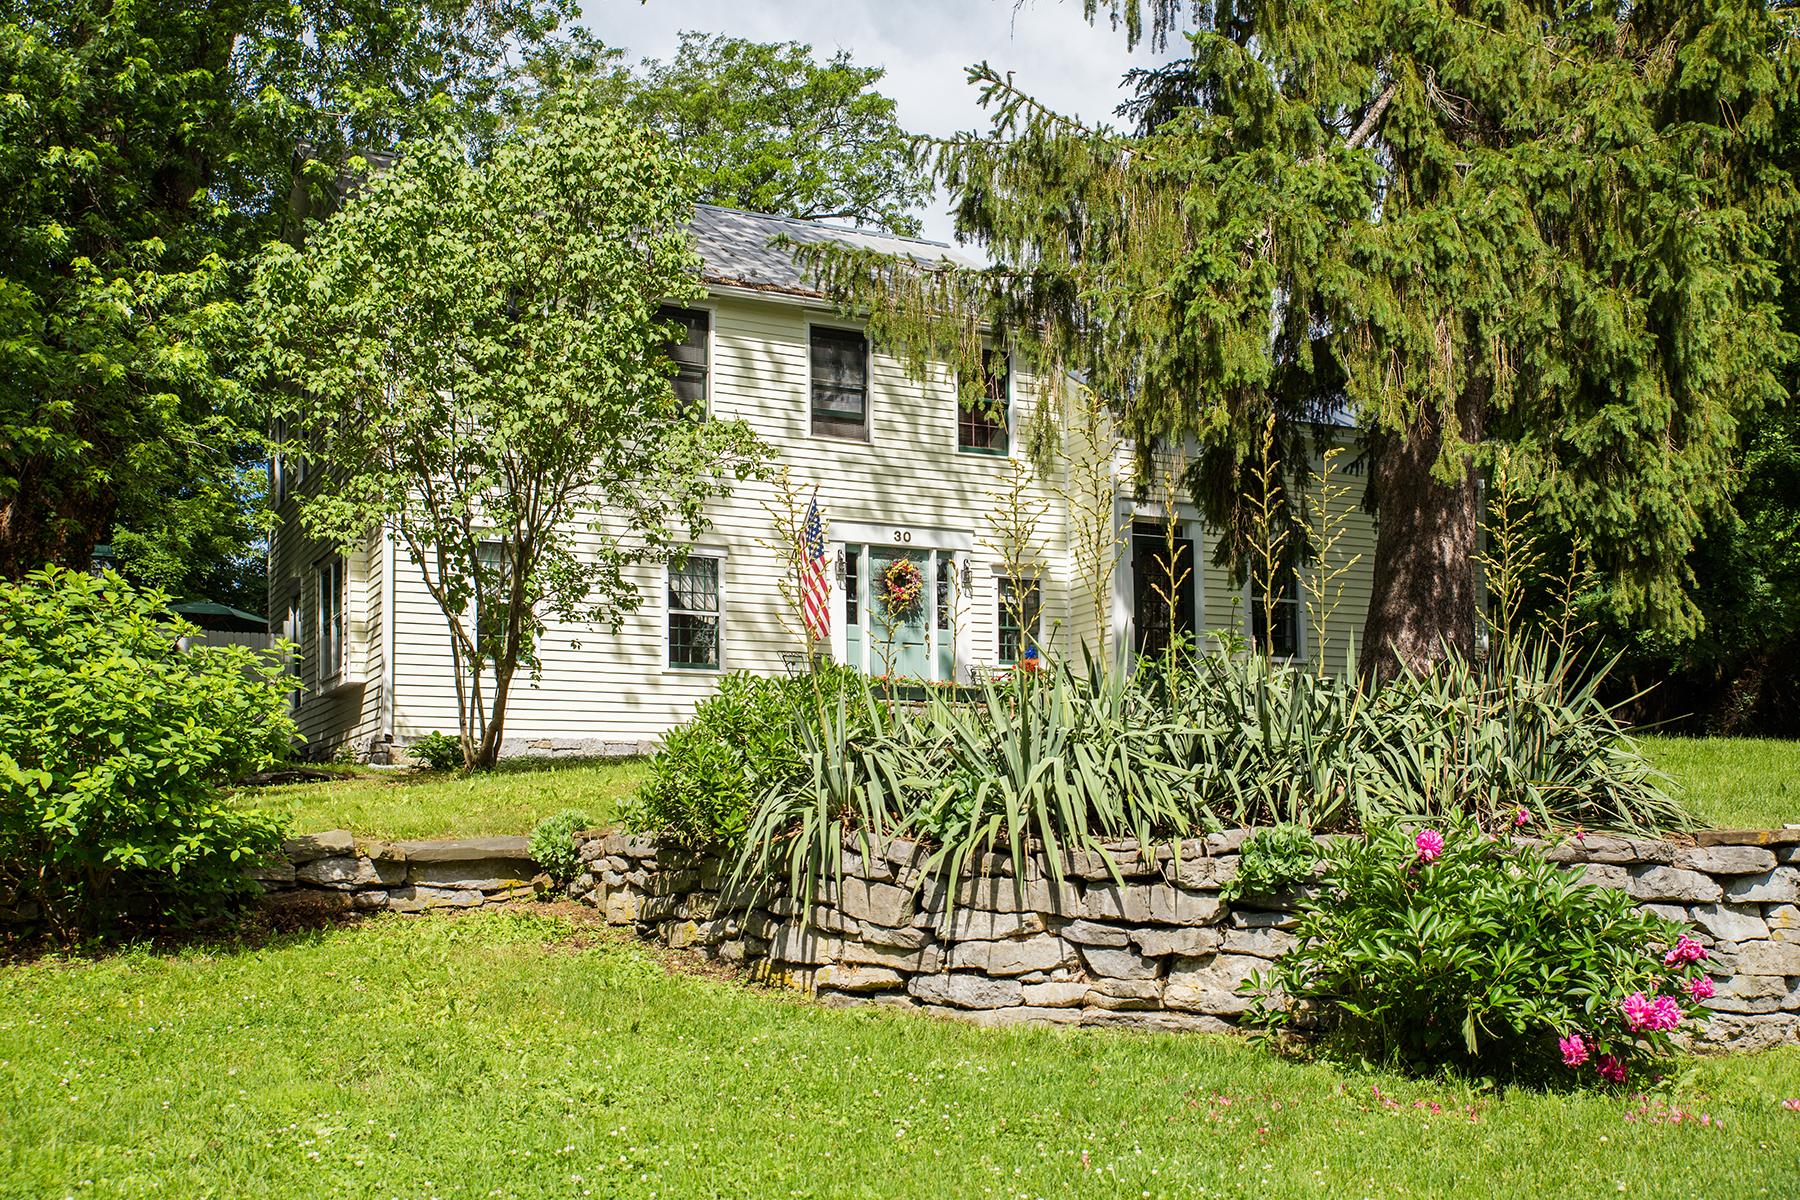 Single Family Home for Sale at Historic Village of Kinderhook Home 30 William Street Kinderhook, New York 12106 United States